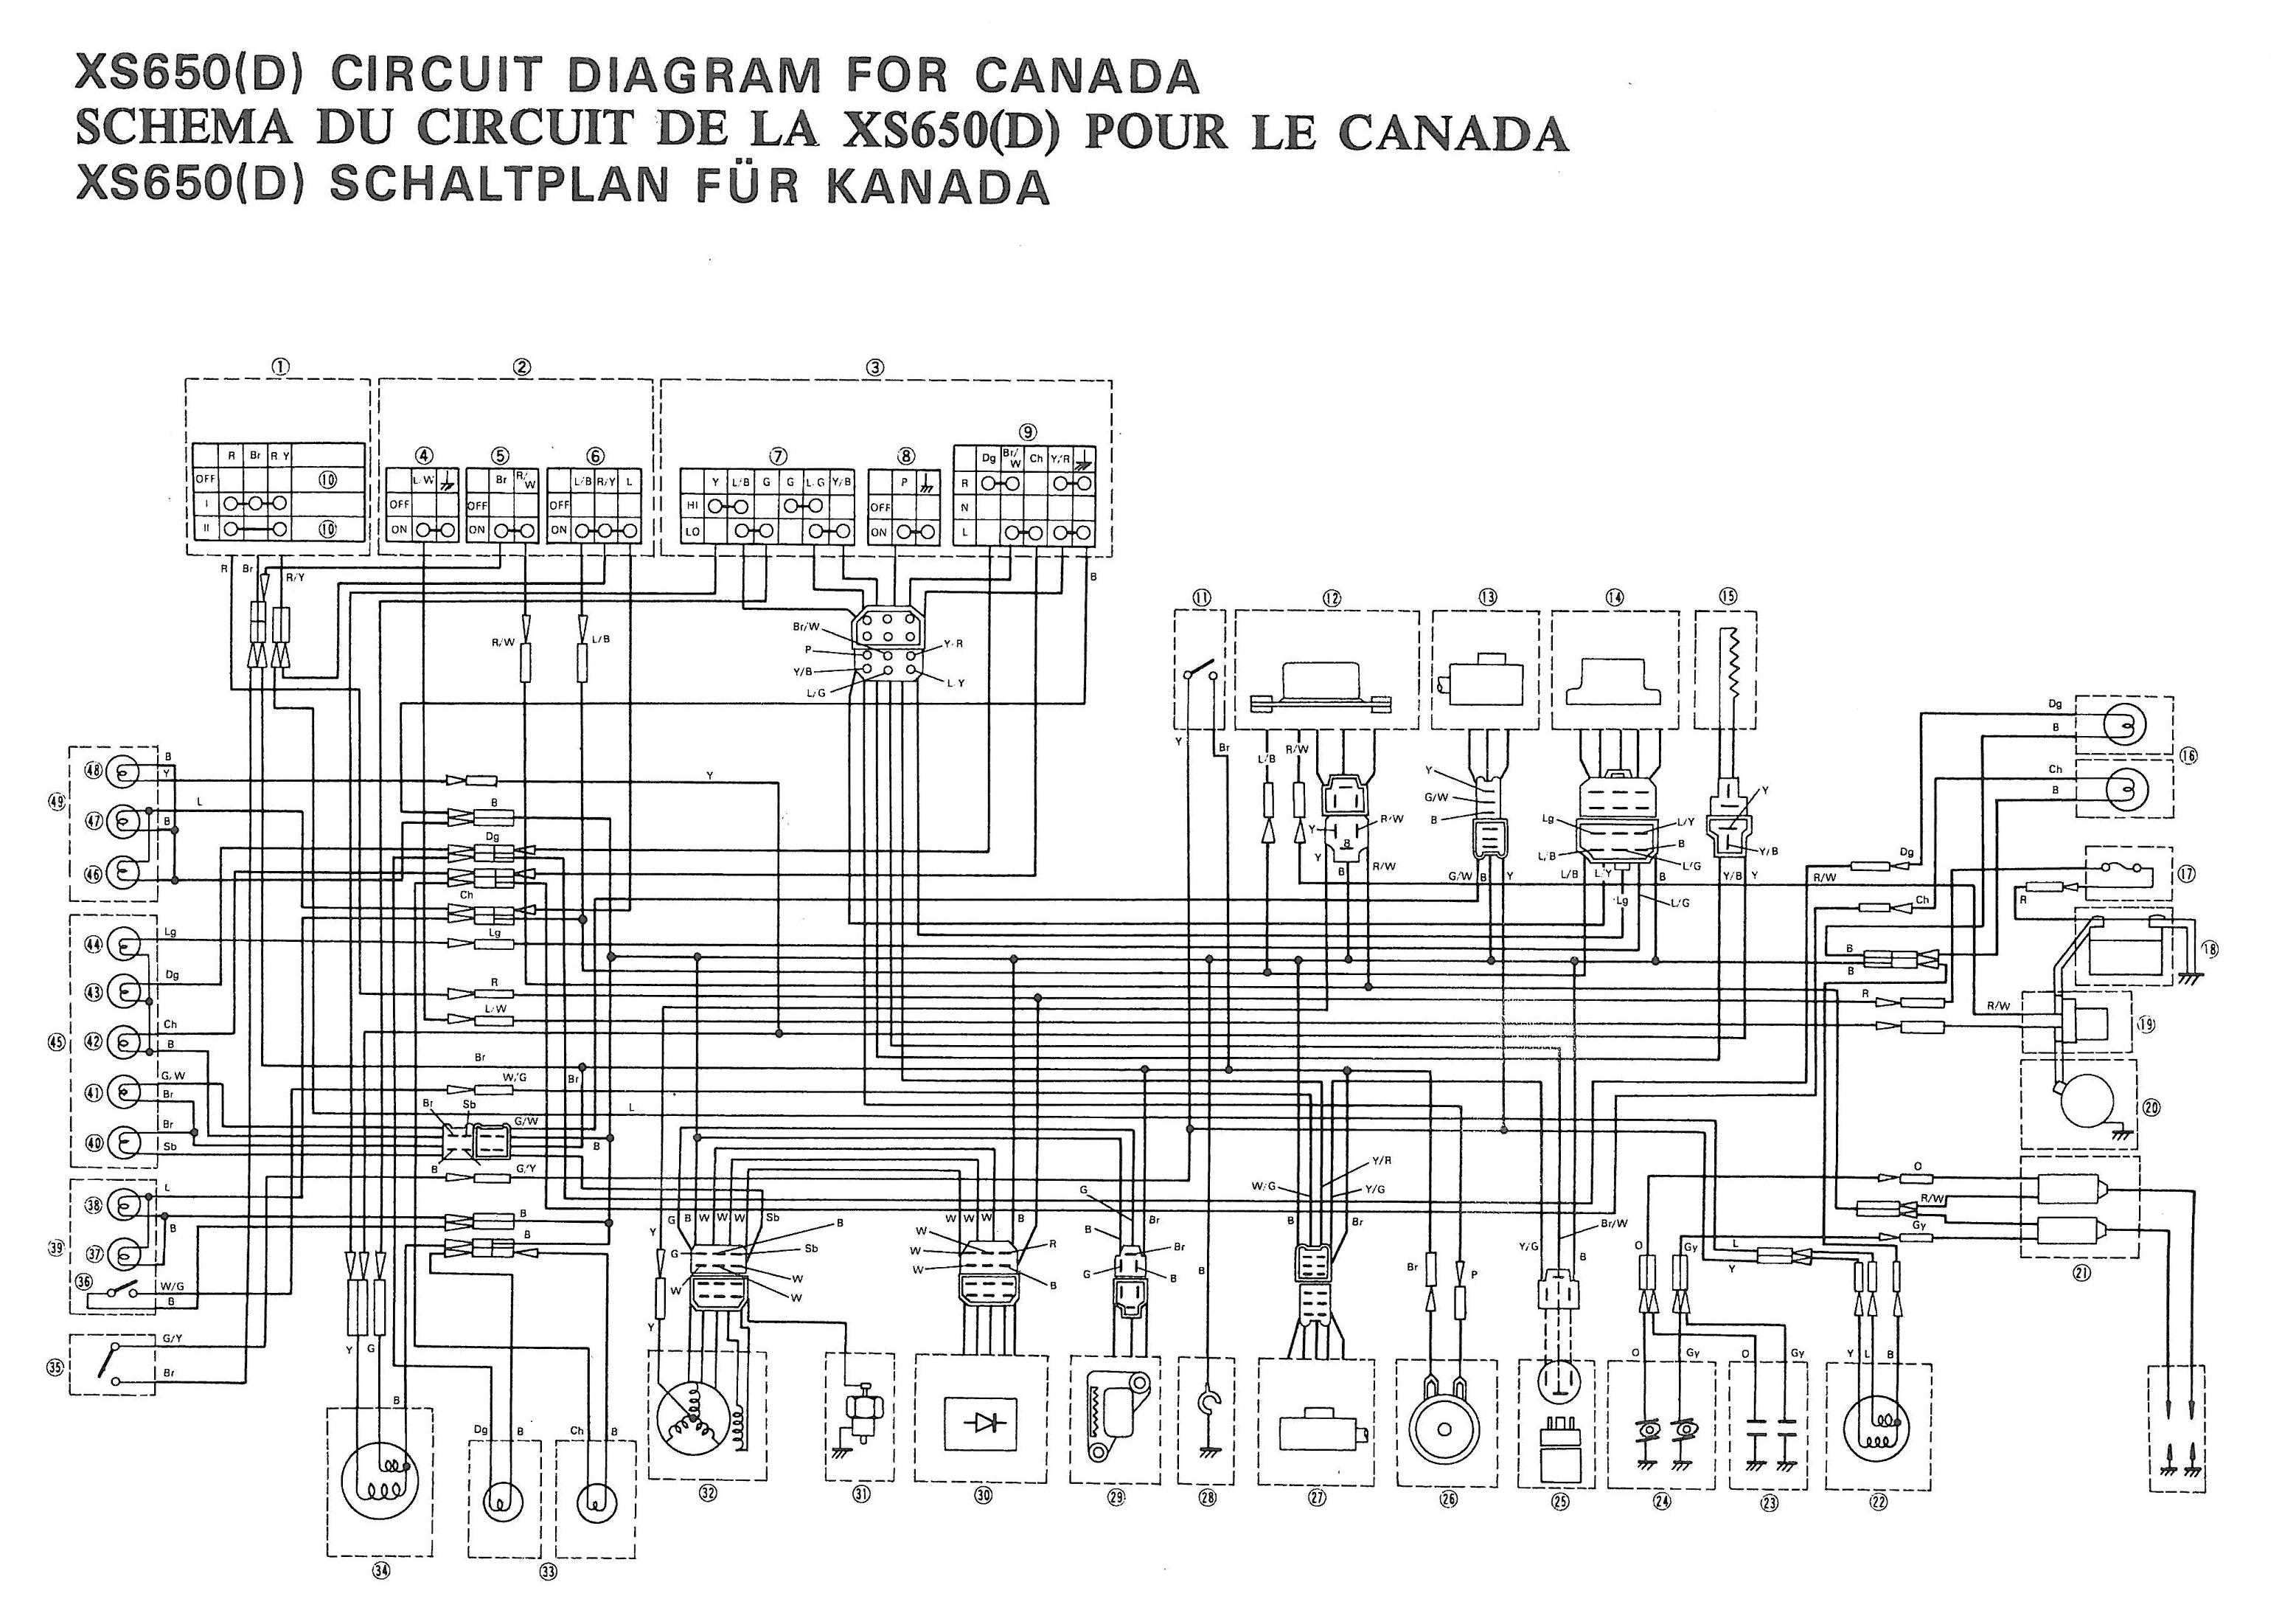 77 xs d wiring canada?w=1000&h=702 some wiring diagrams yamaha xs650 forum readingrat net 1978 yamaha xs650 wiring diagram at crackthecode.co